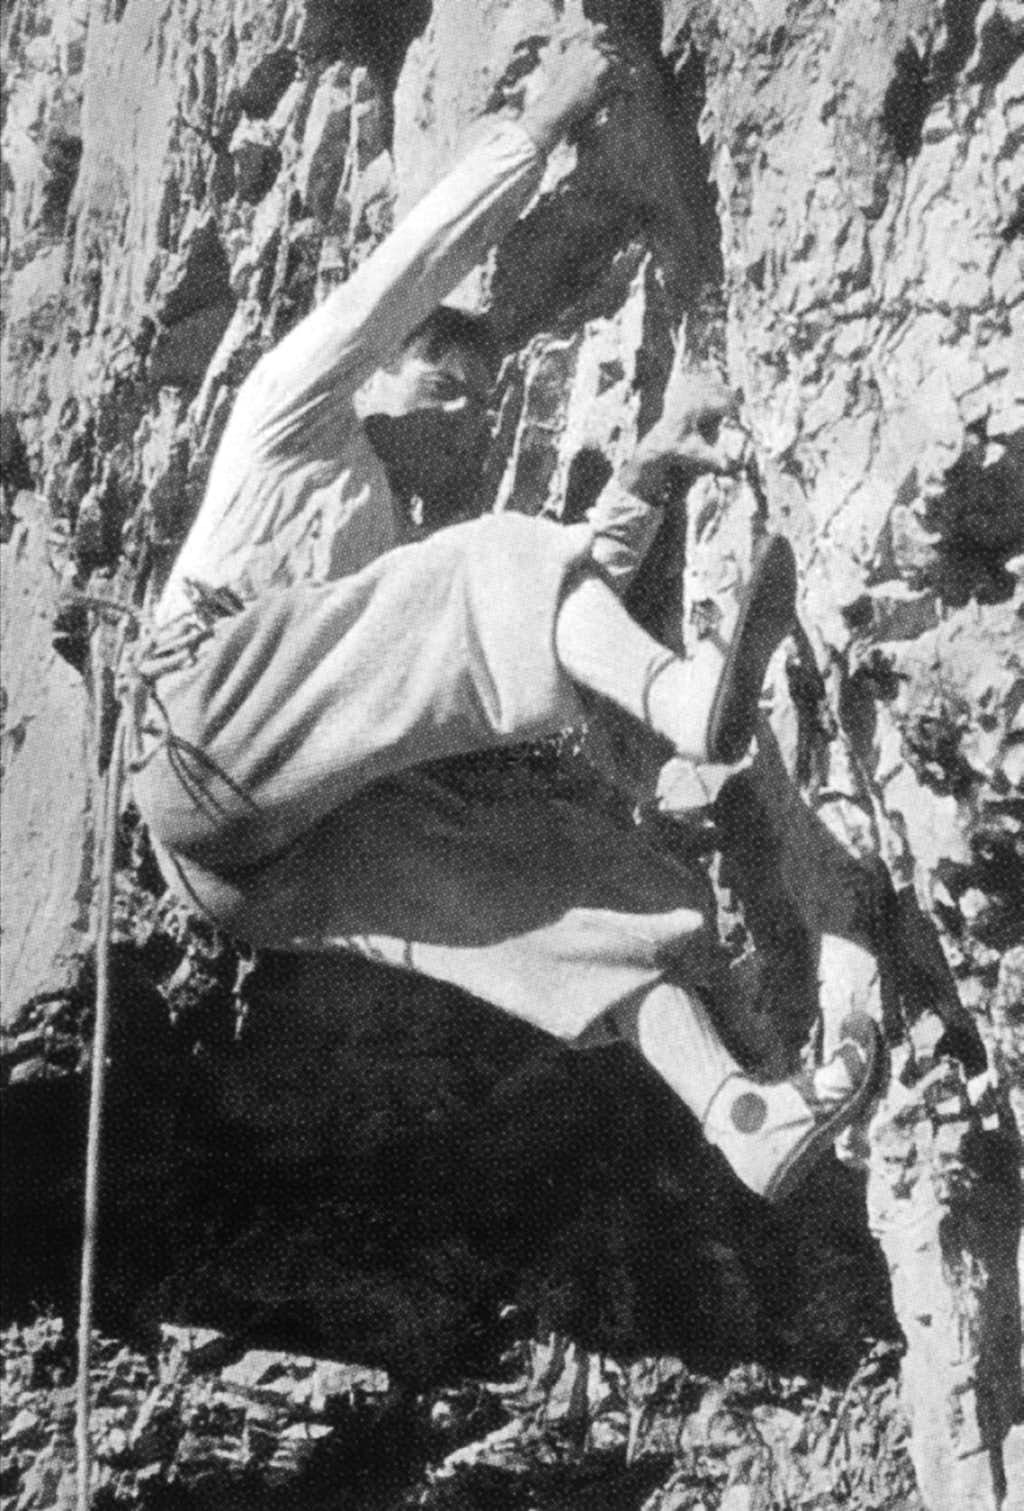 Emilio Comici and his climbing style